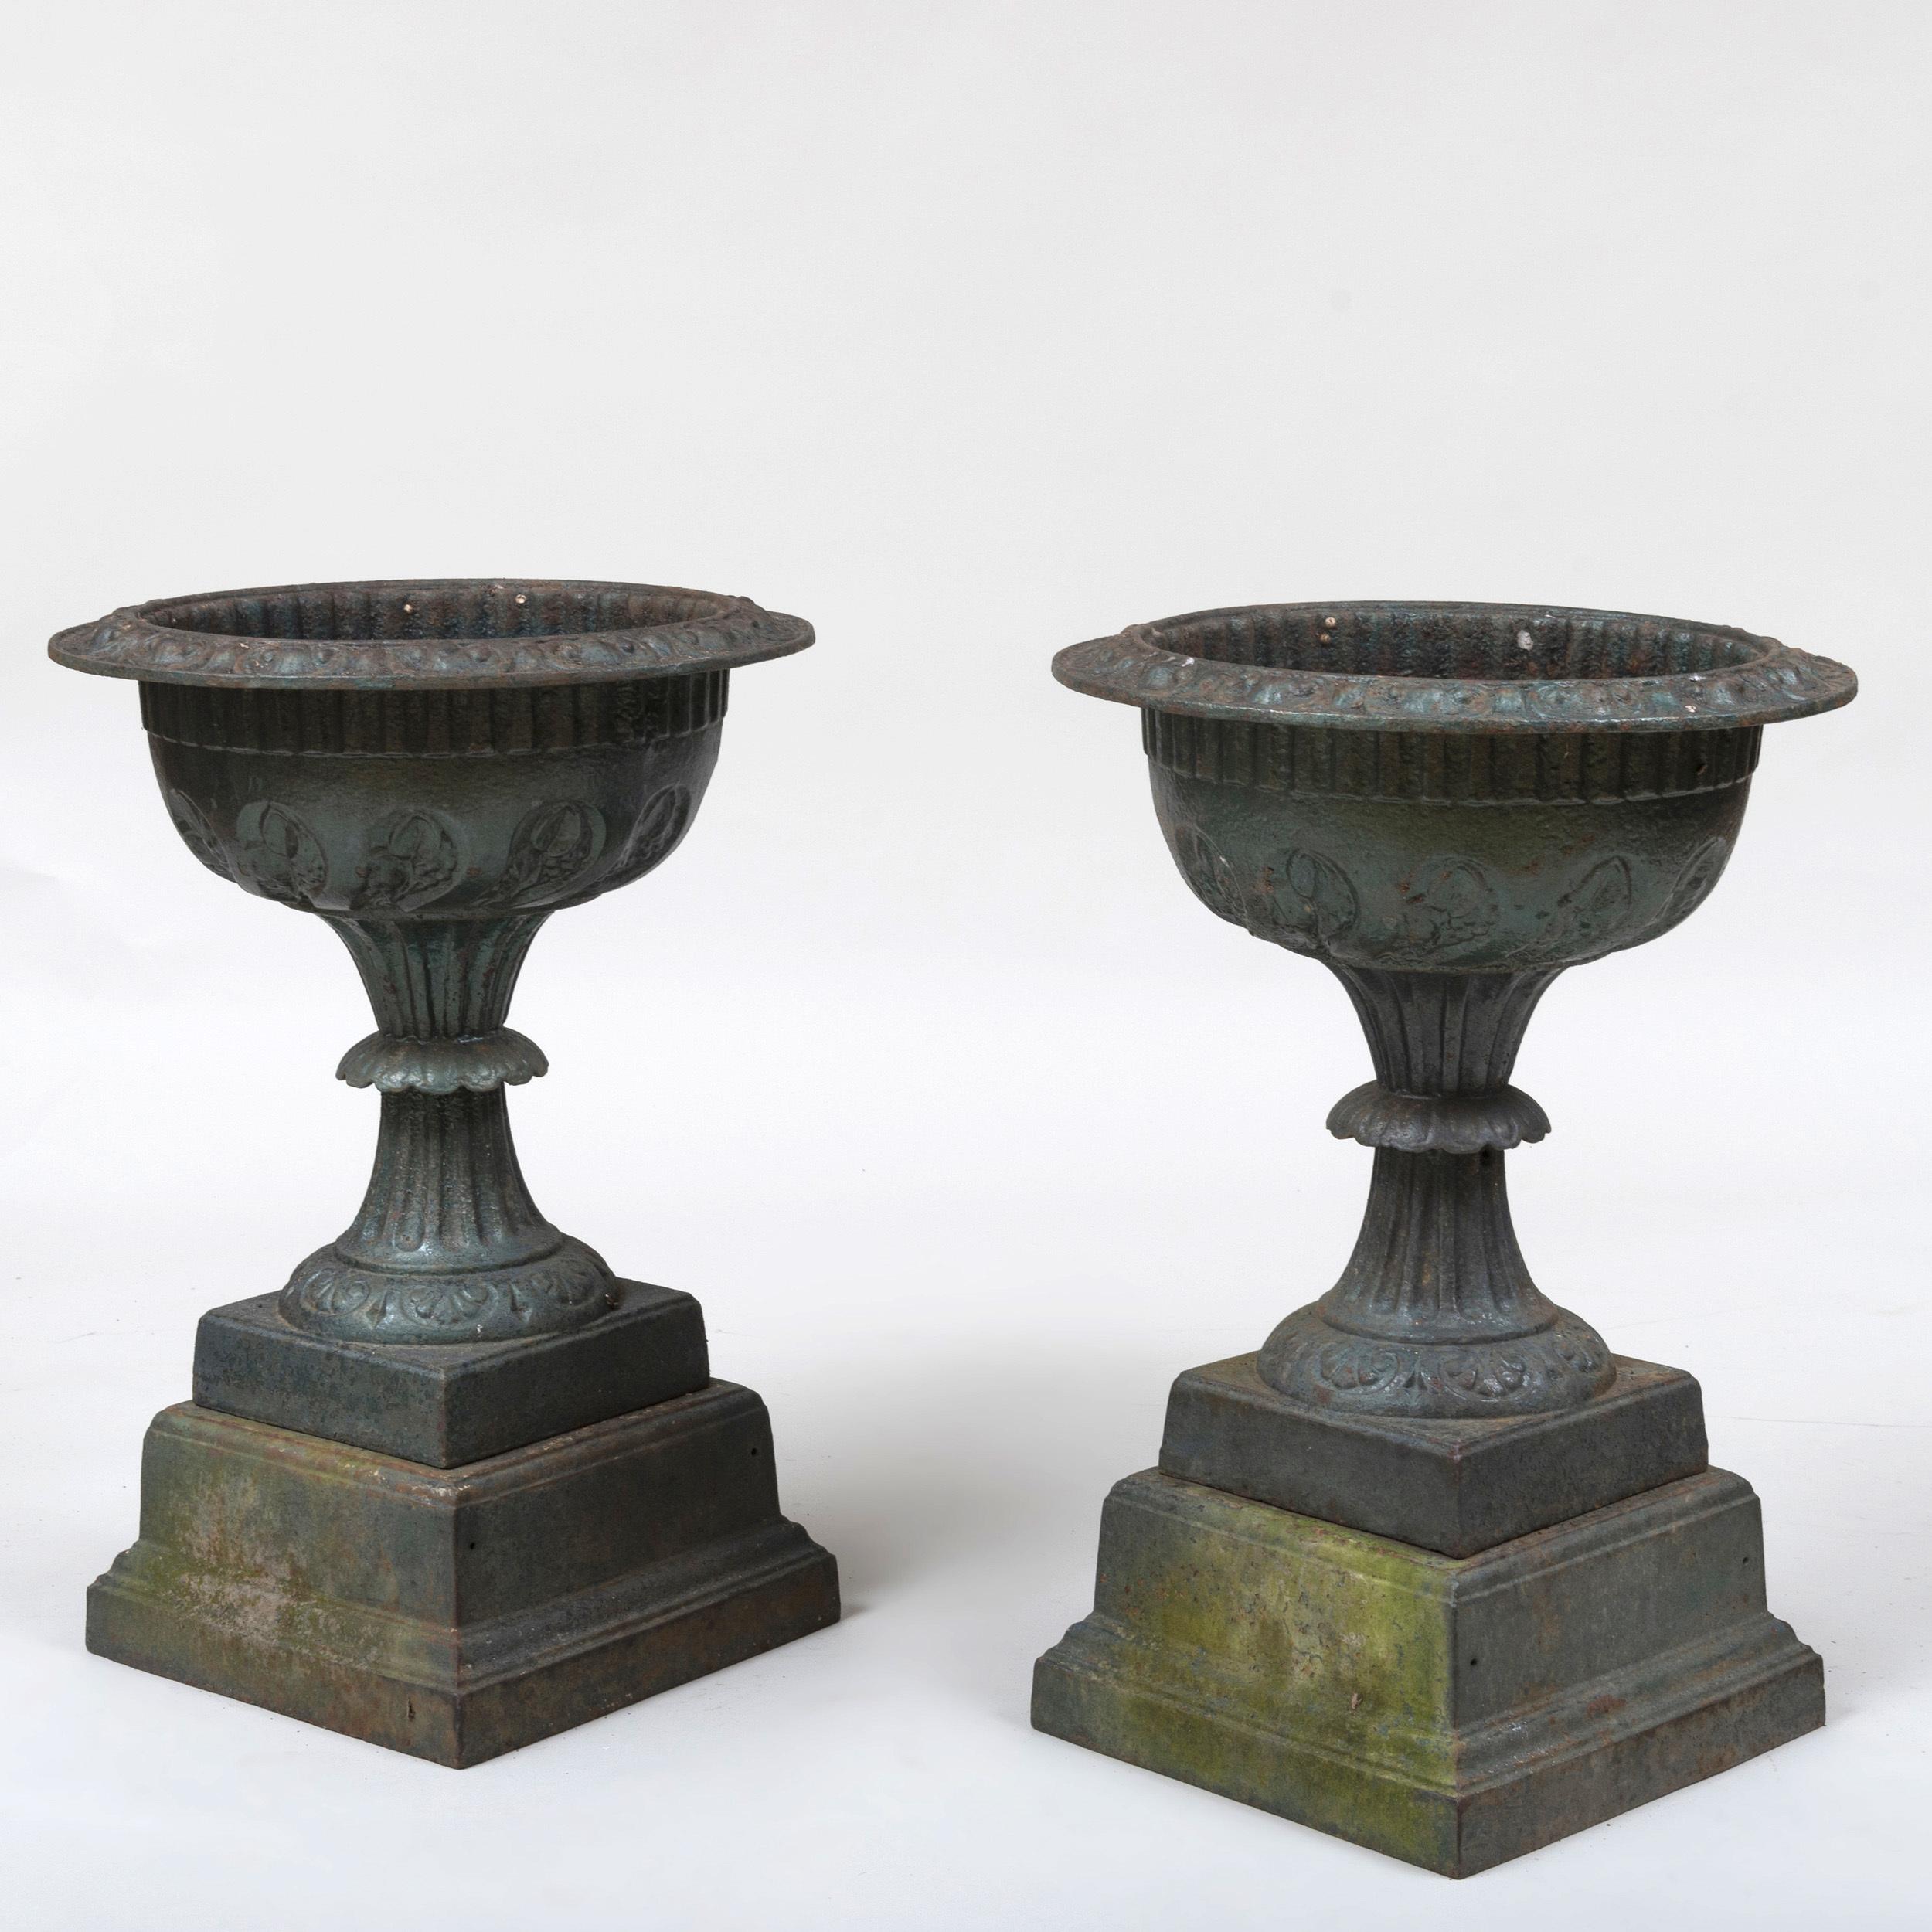 Painted Cast Iron Garden Urns, Dayton, Ohio